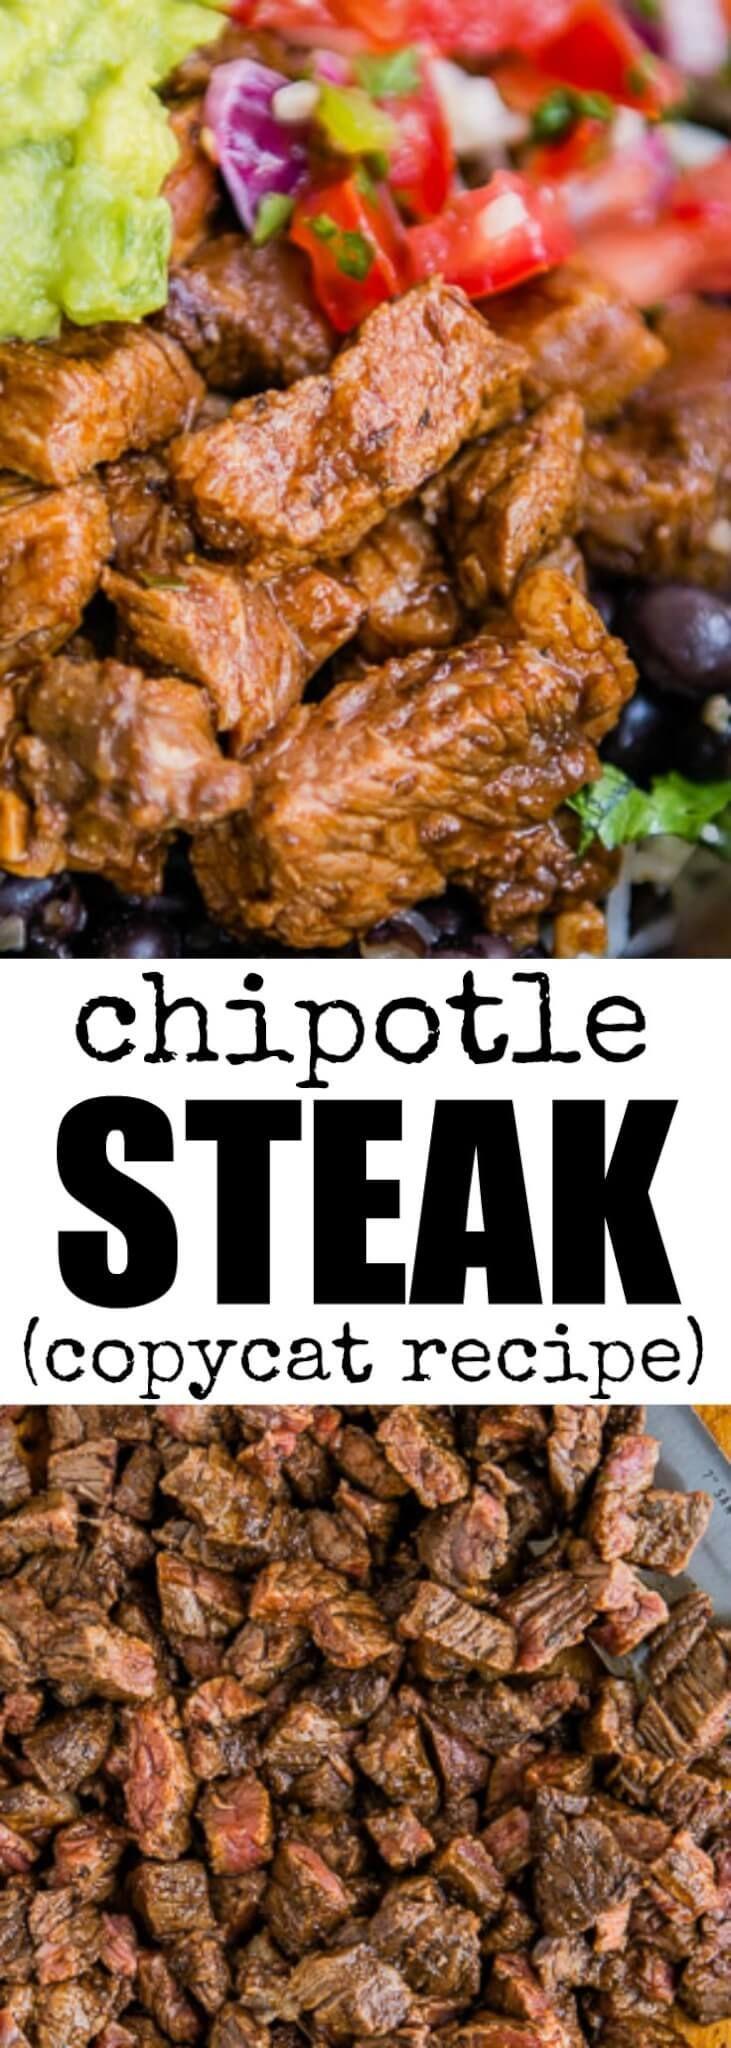 157 best Best Copycat Recipes images on Pinterest | Chili, Chilis ...